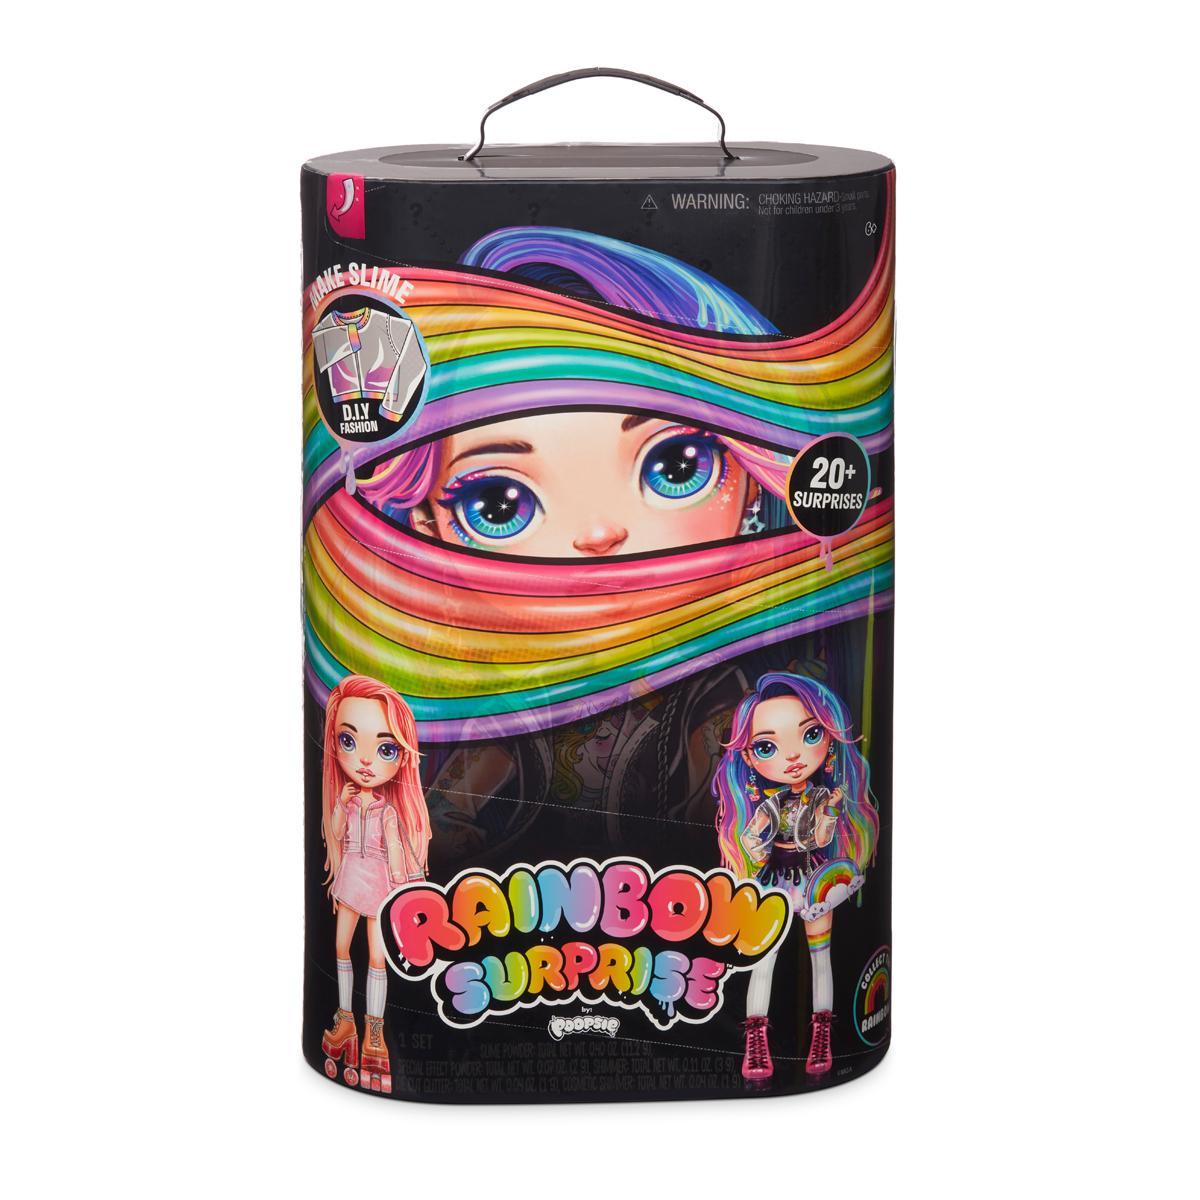 Poopsie Rainbow Surprise instore @ B&M Sussex - £29.99